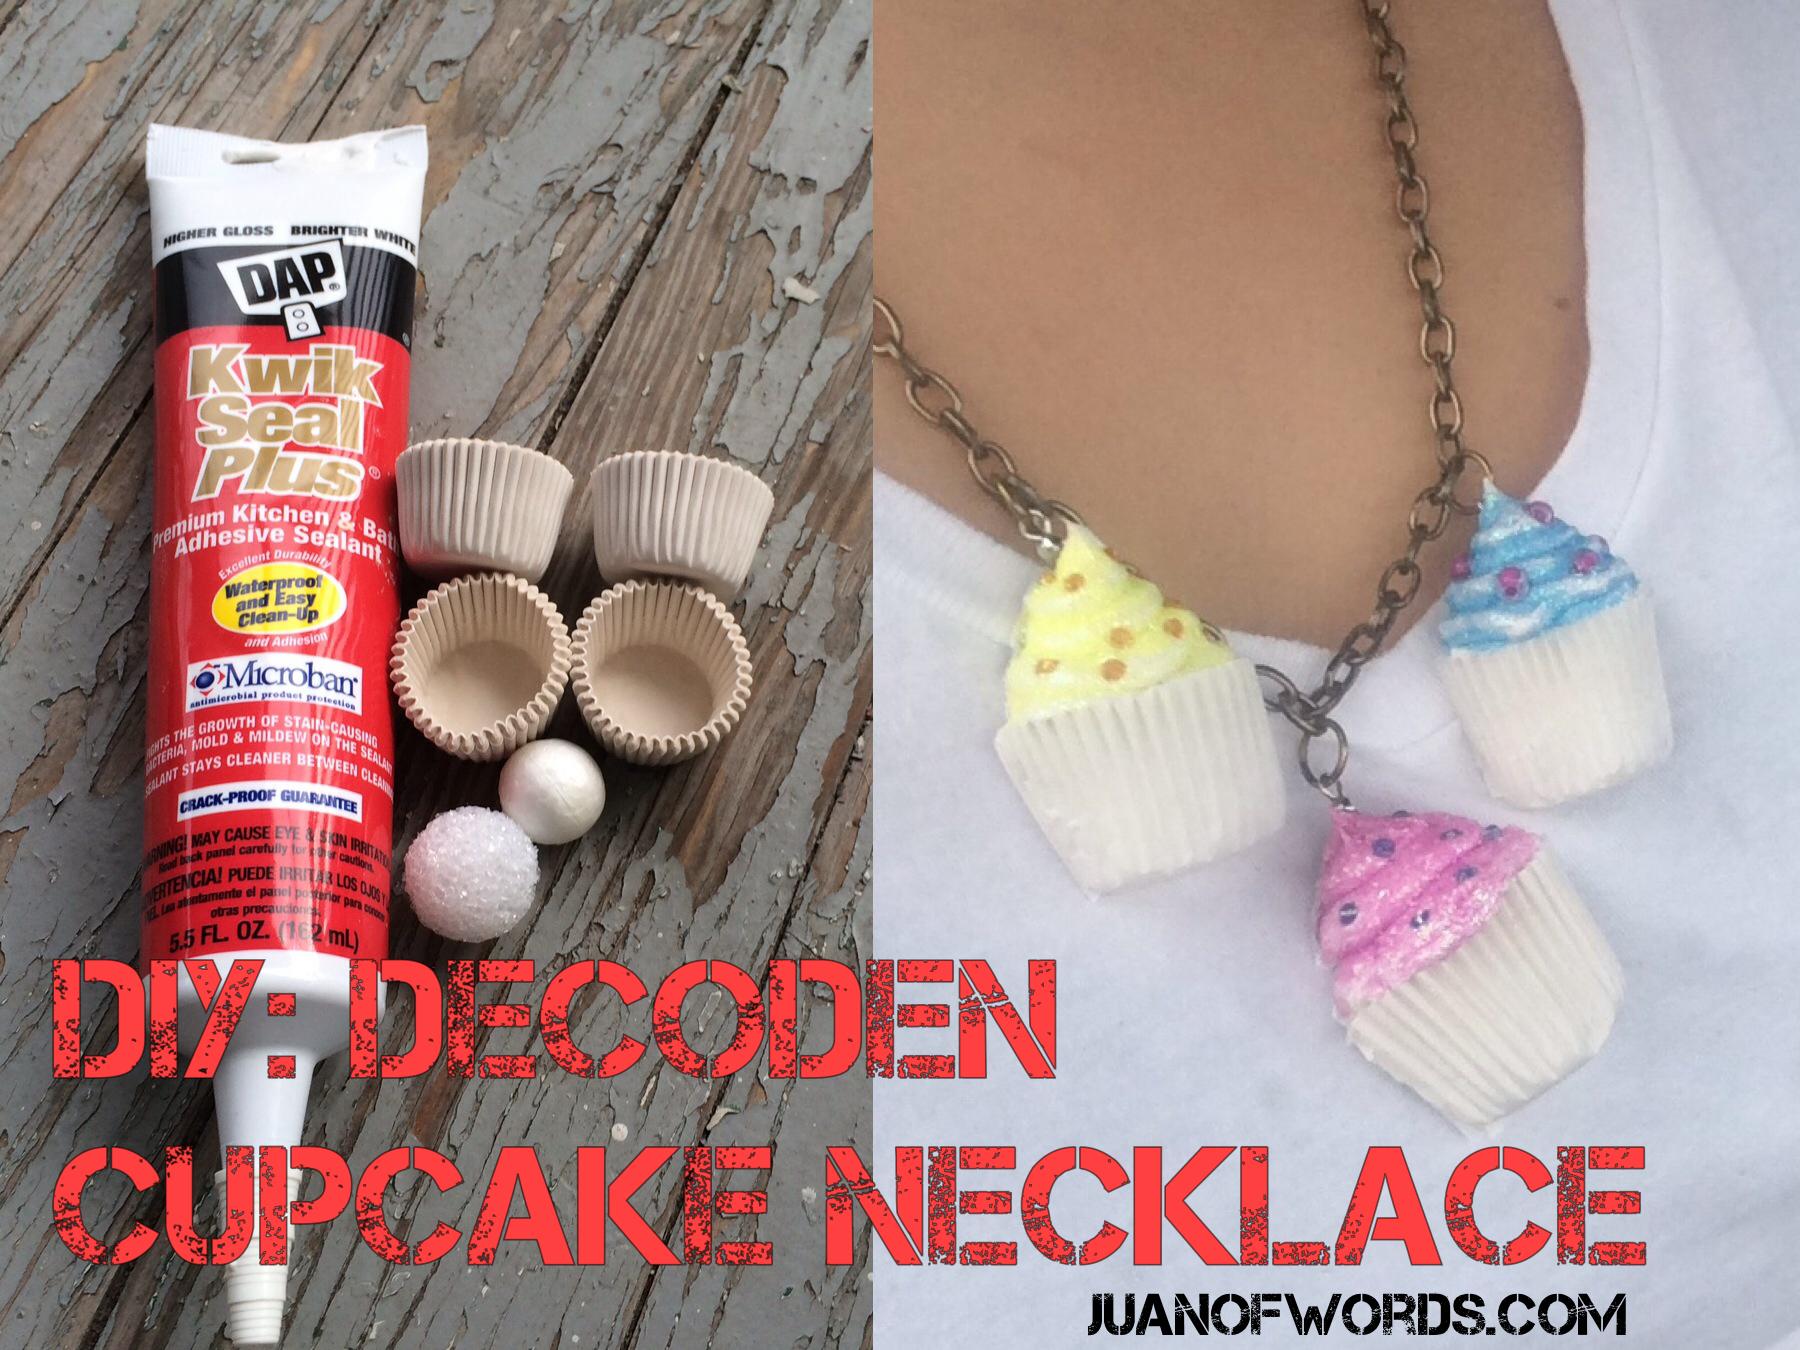 Decoden Cupcake Necklace